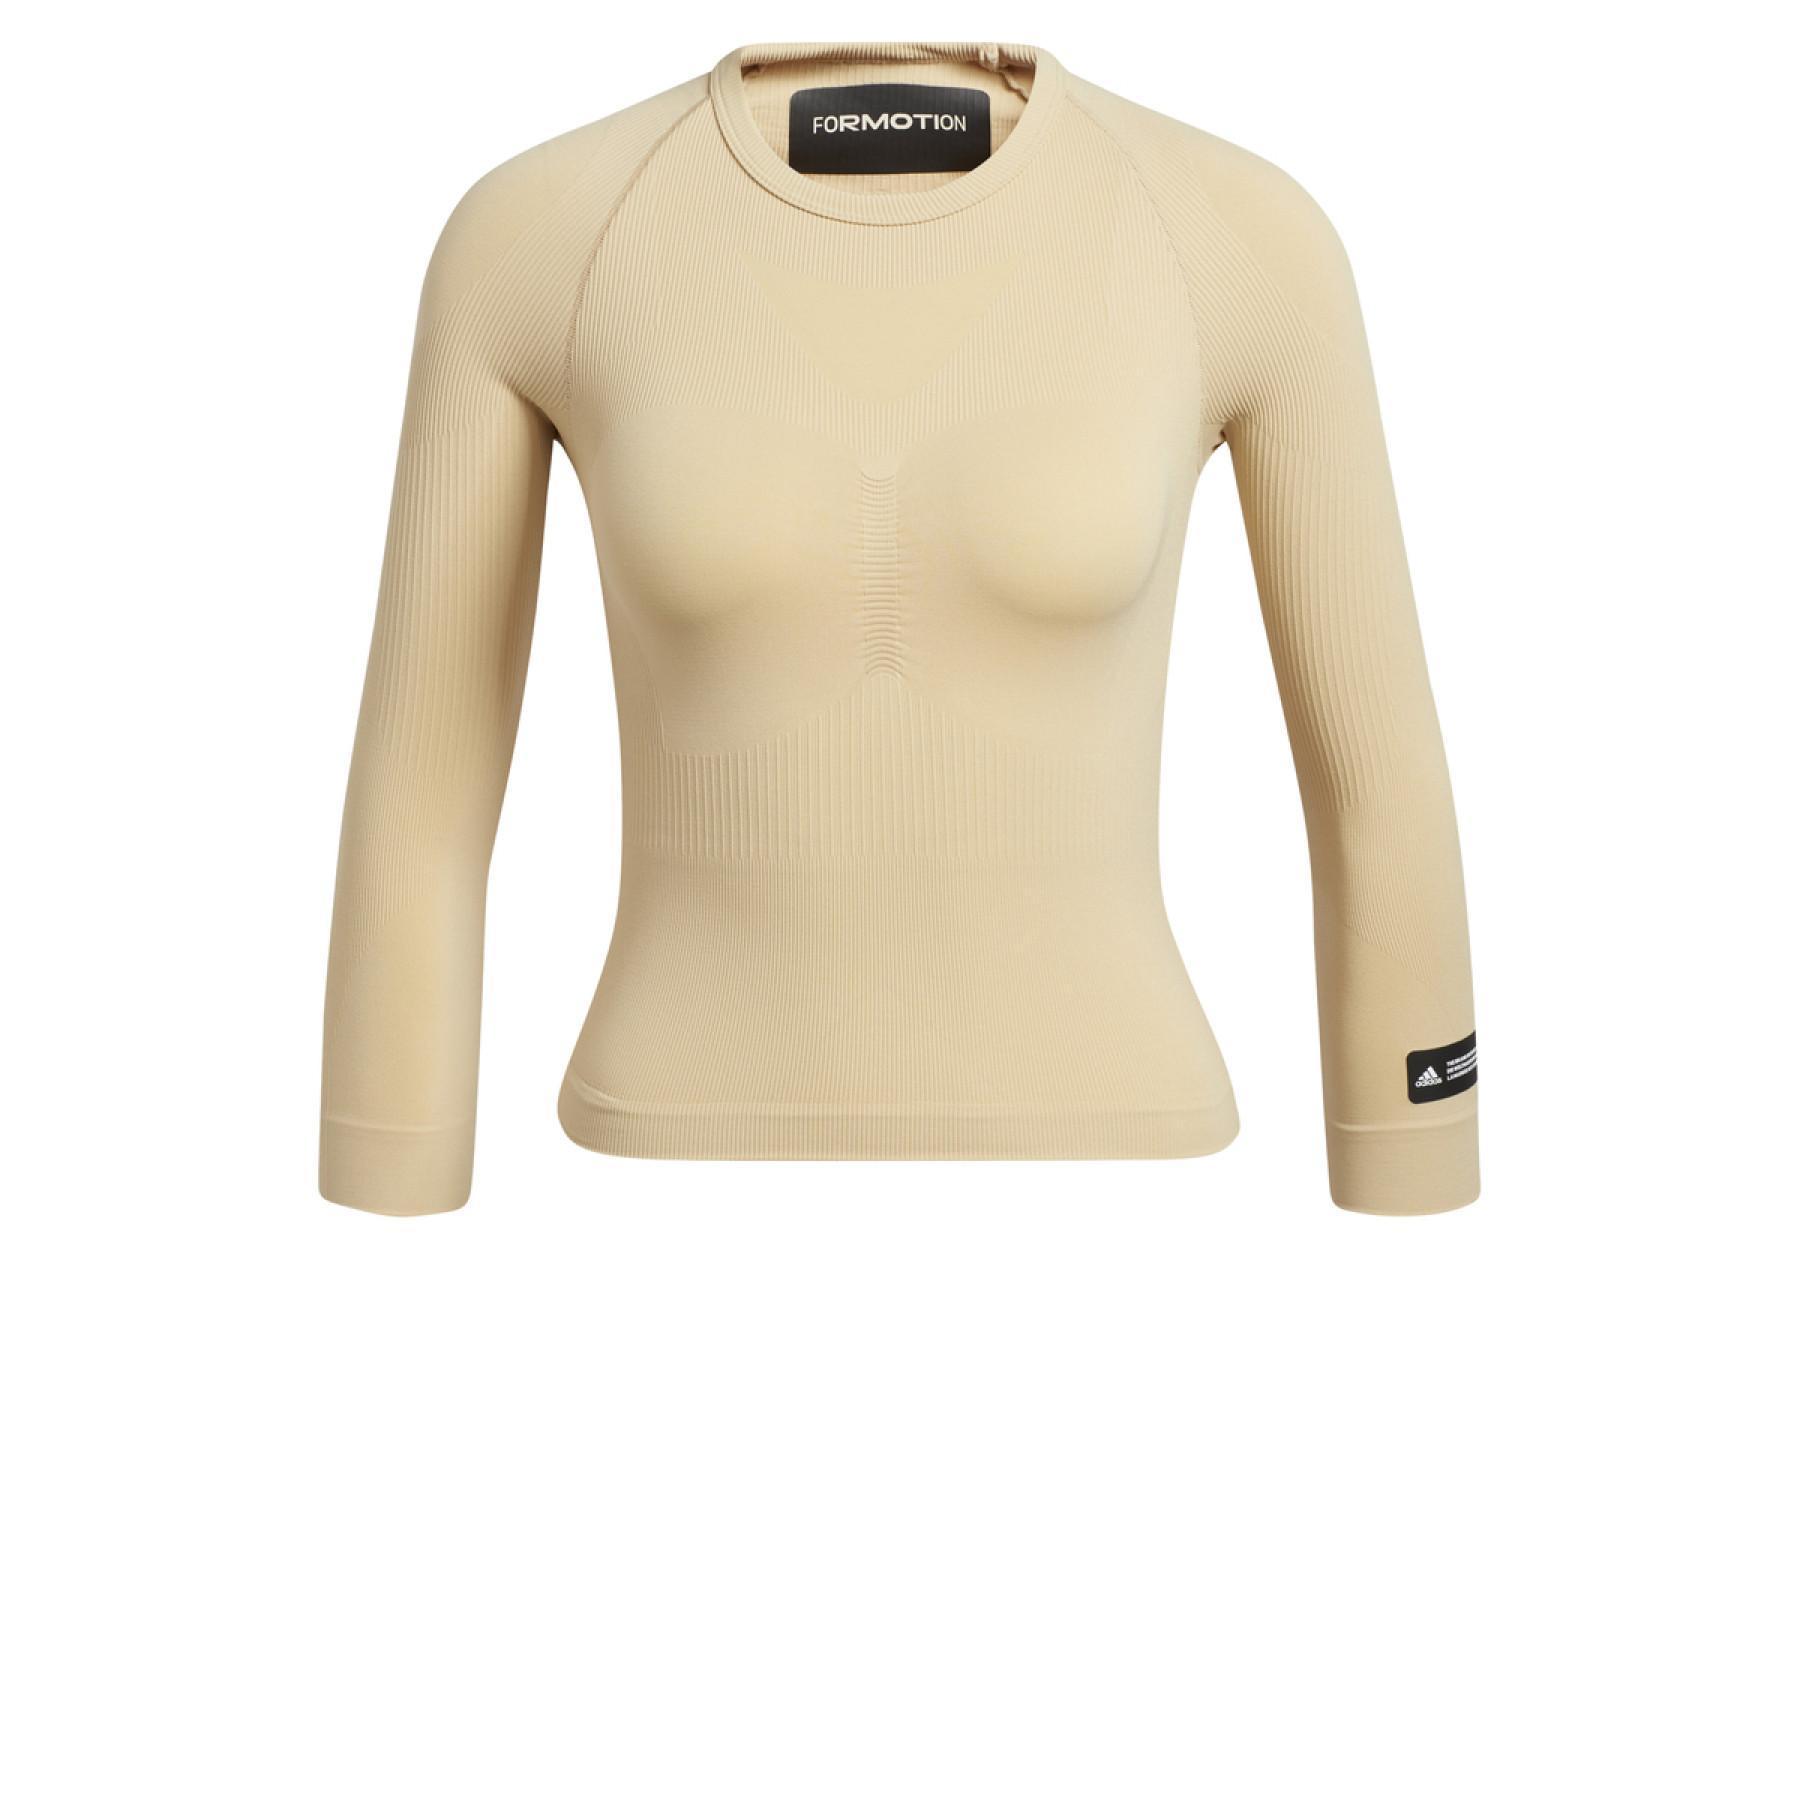 adidas Women's Formotion Cropped Training T-Shirt